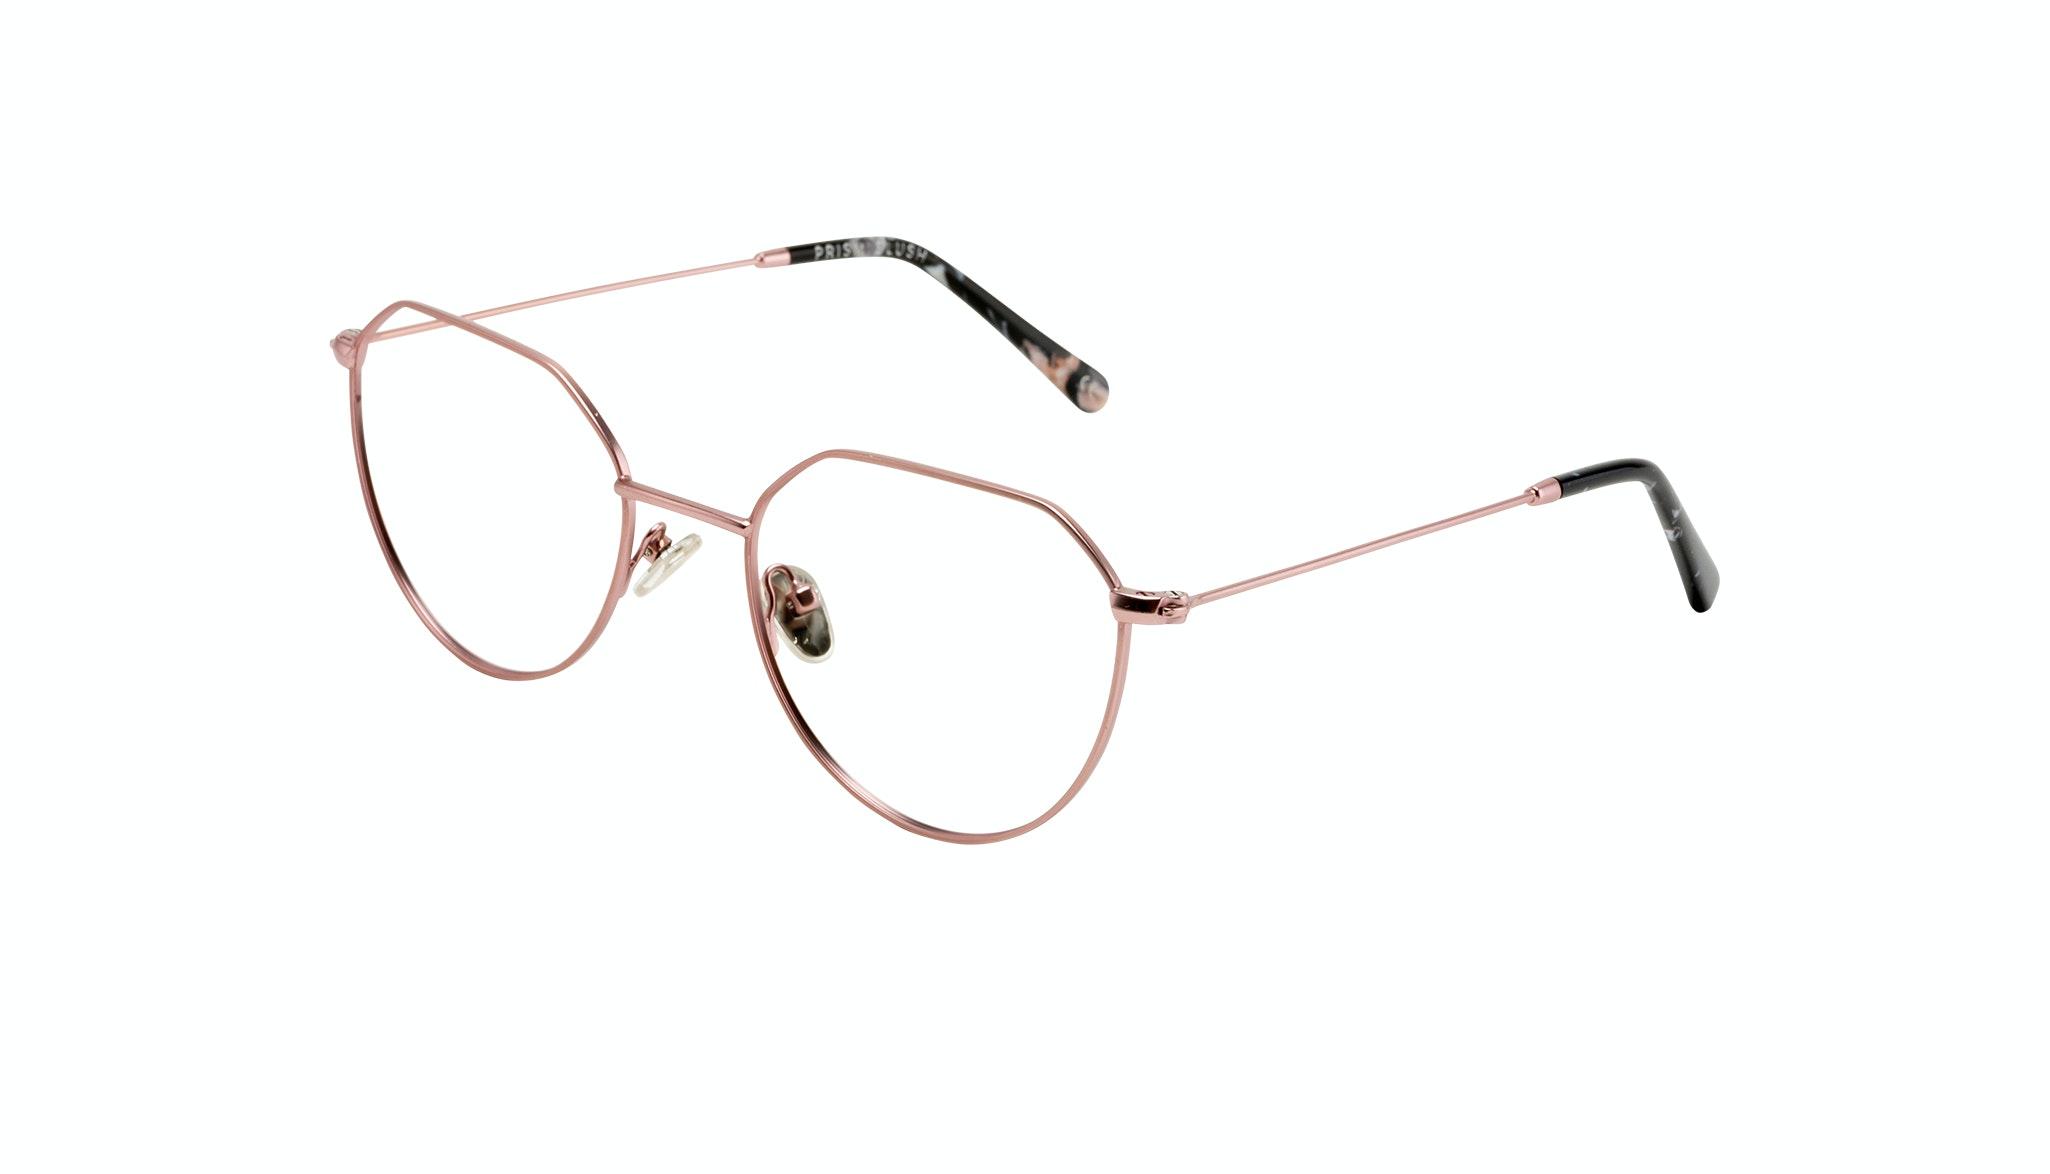 Affordable Fashion Glasses Round Eyeglasses Women Prism Blush Tilt